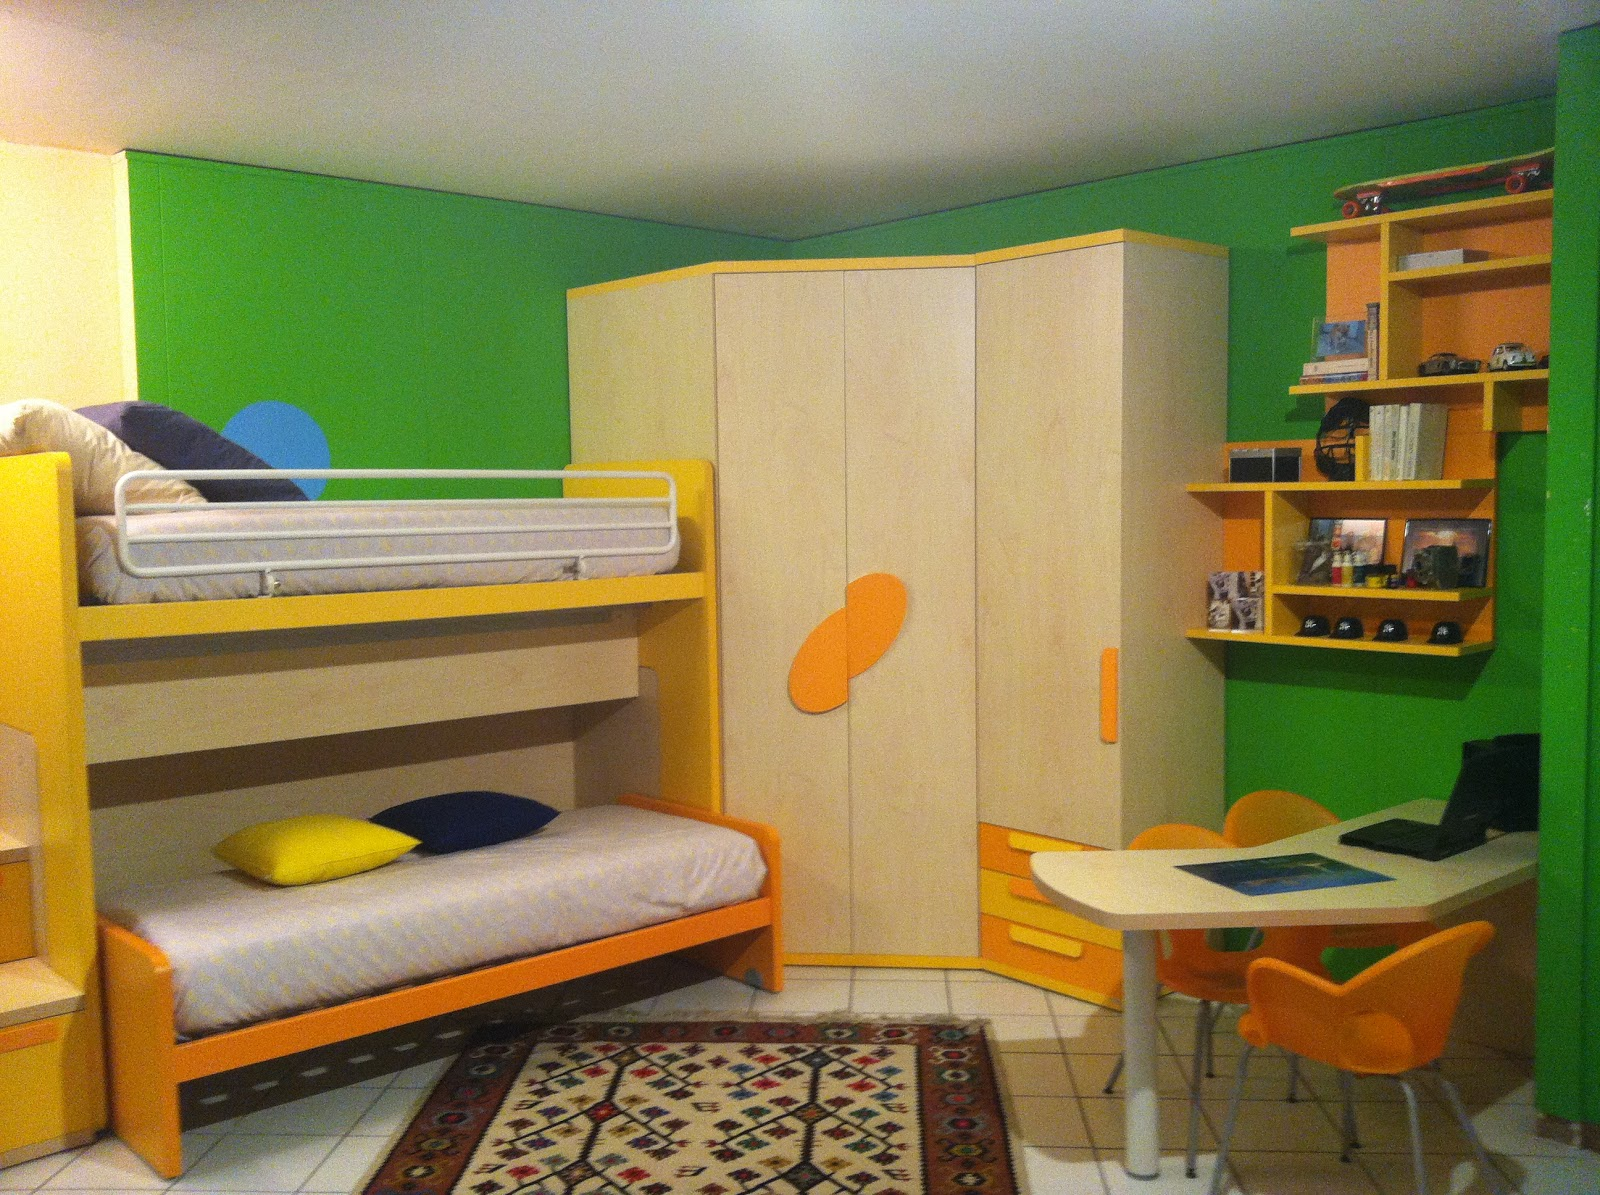 Bonetti camerette bonetti bedrooms camerette in offerta for Camerette in offerta